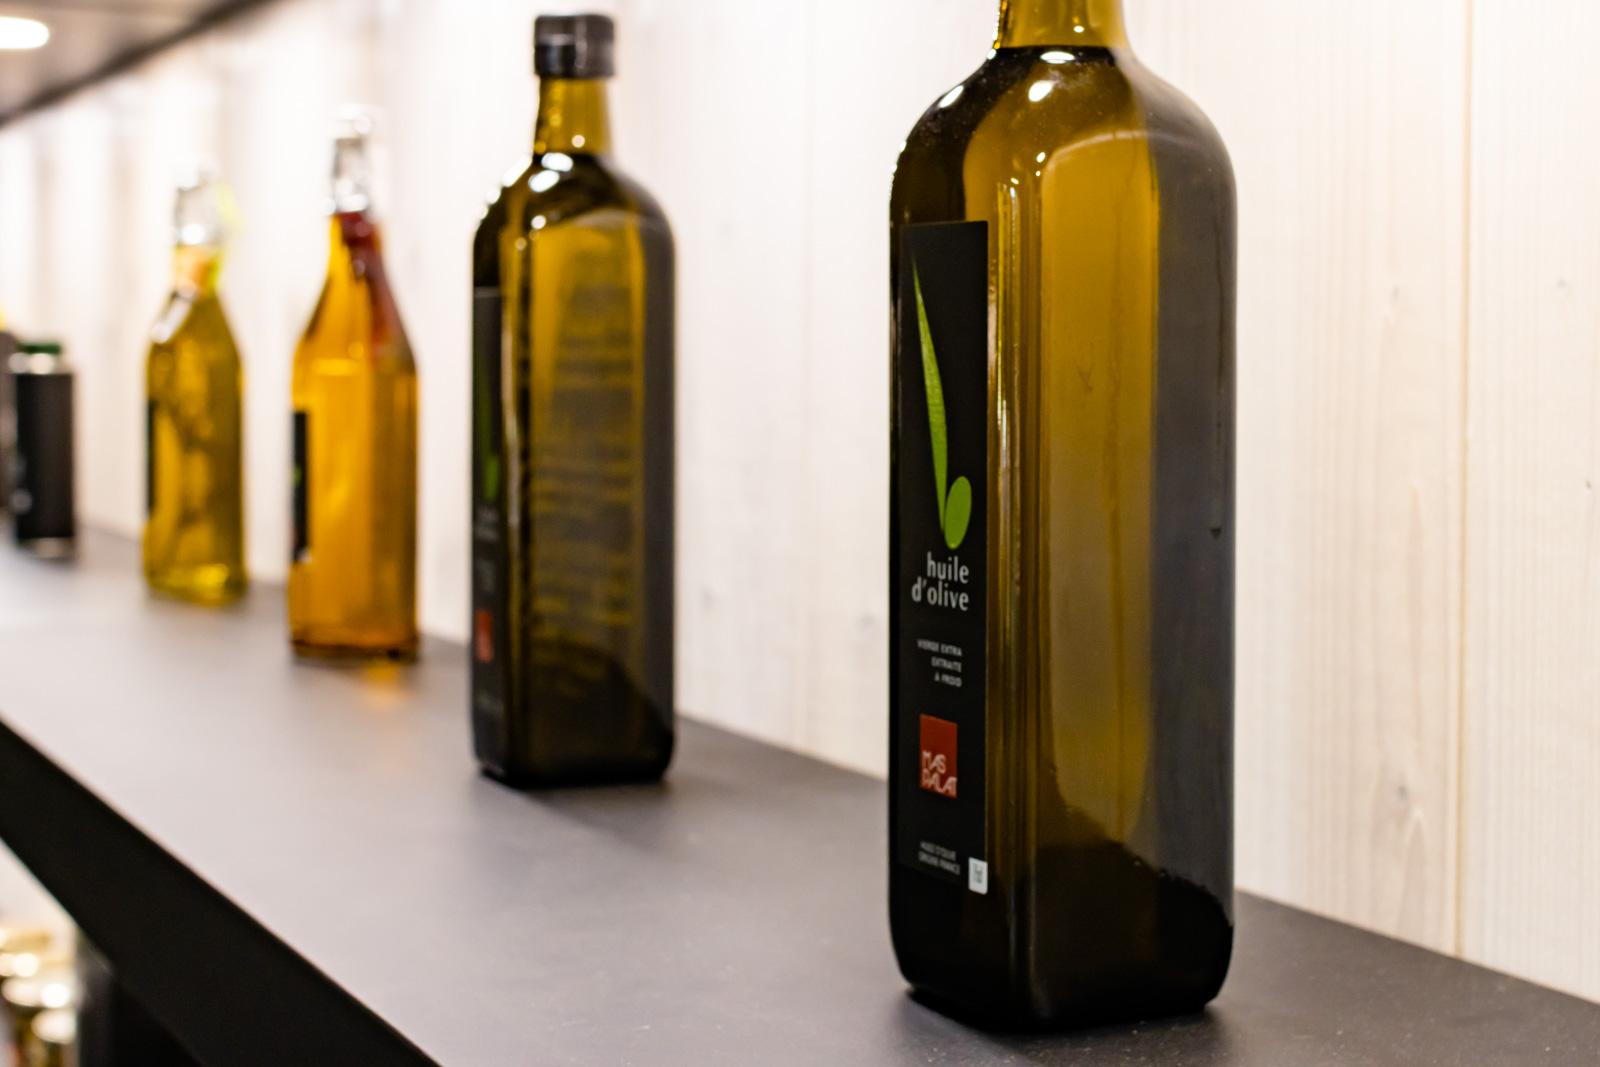 Huiles d'olive du Mas Palat